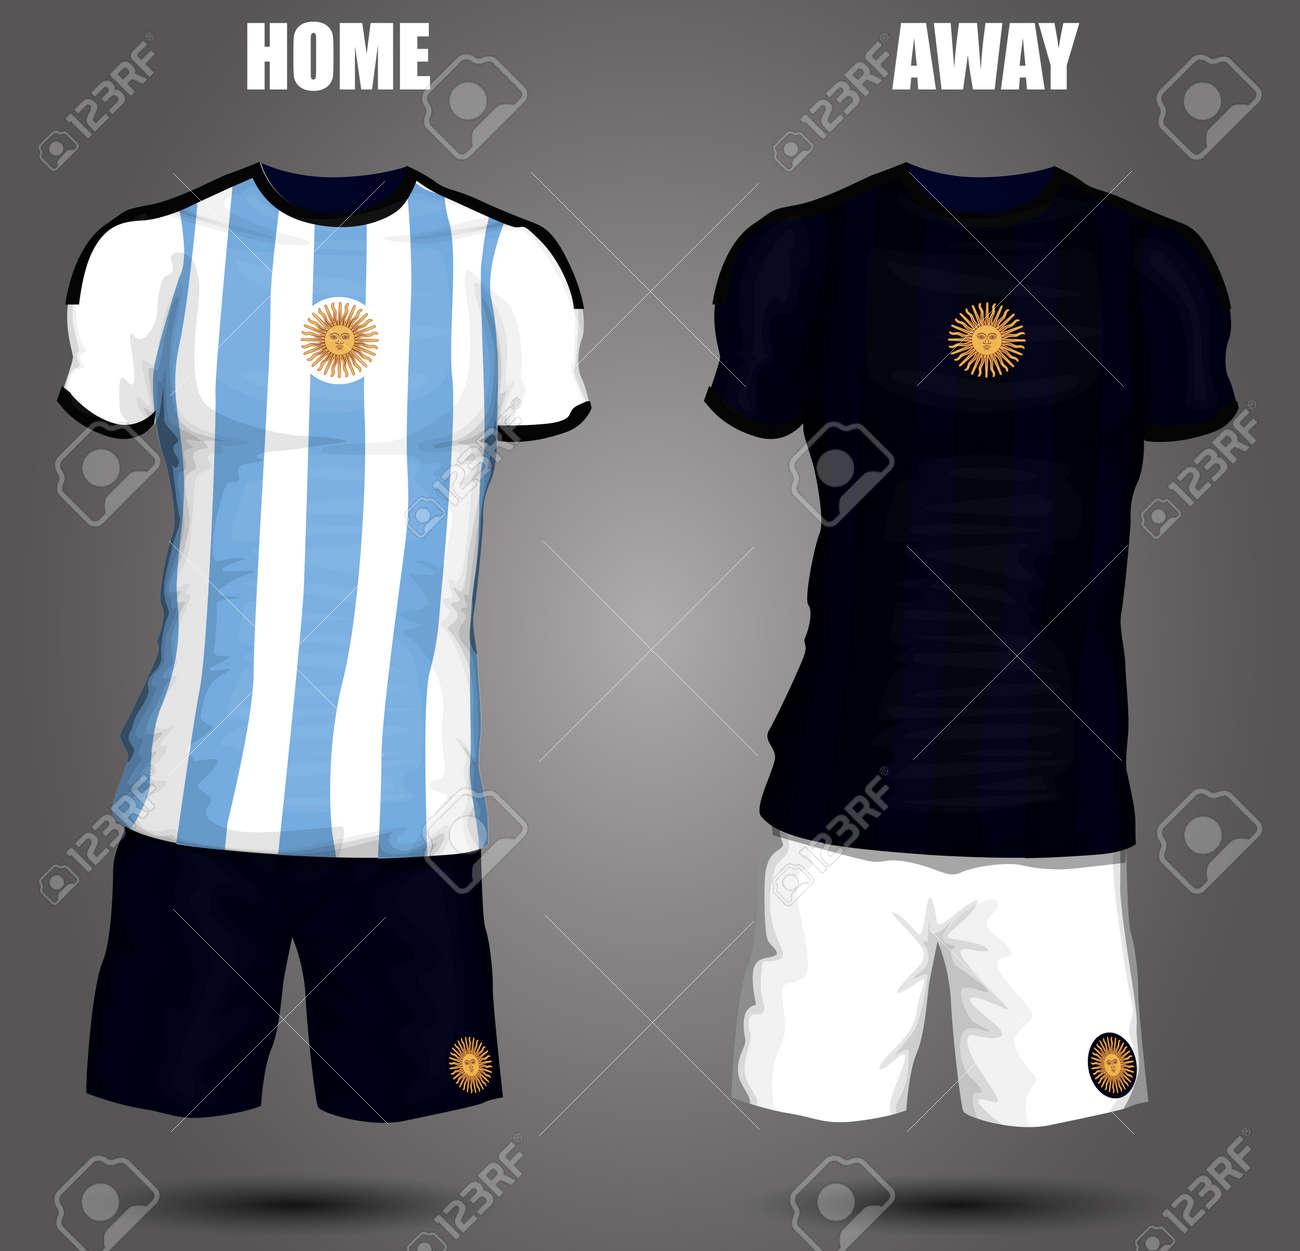 6c7045f12 Argentina soccer jersey Stock Vector - 28036506